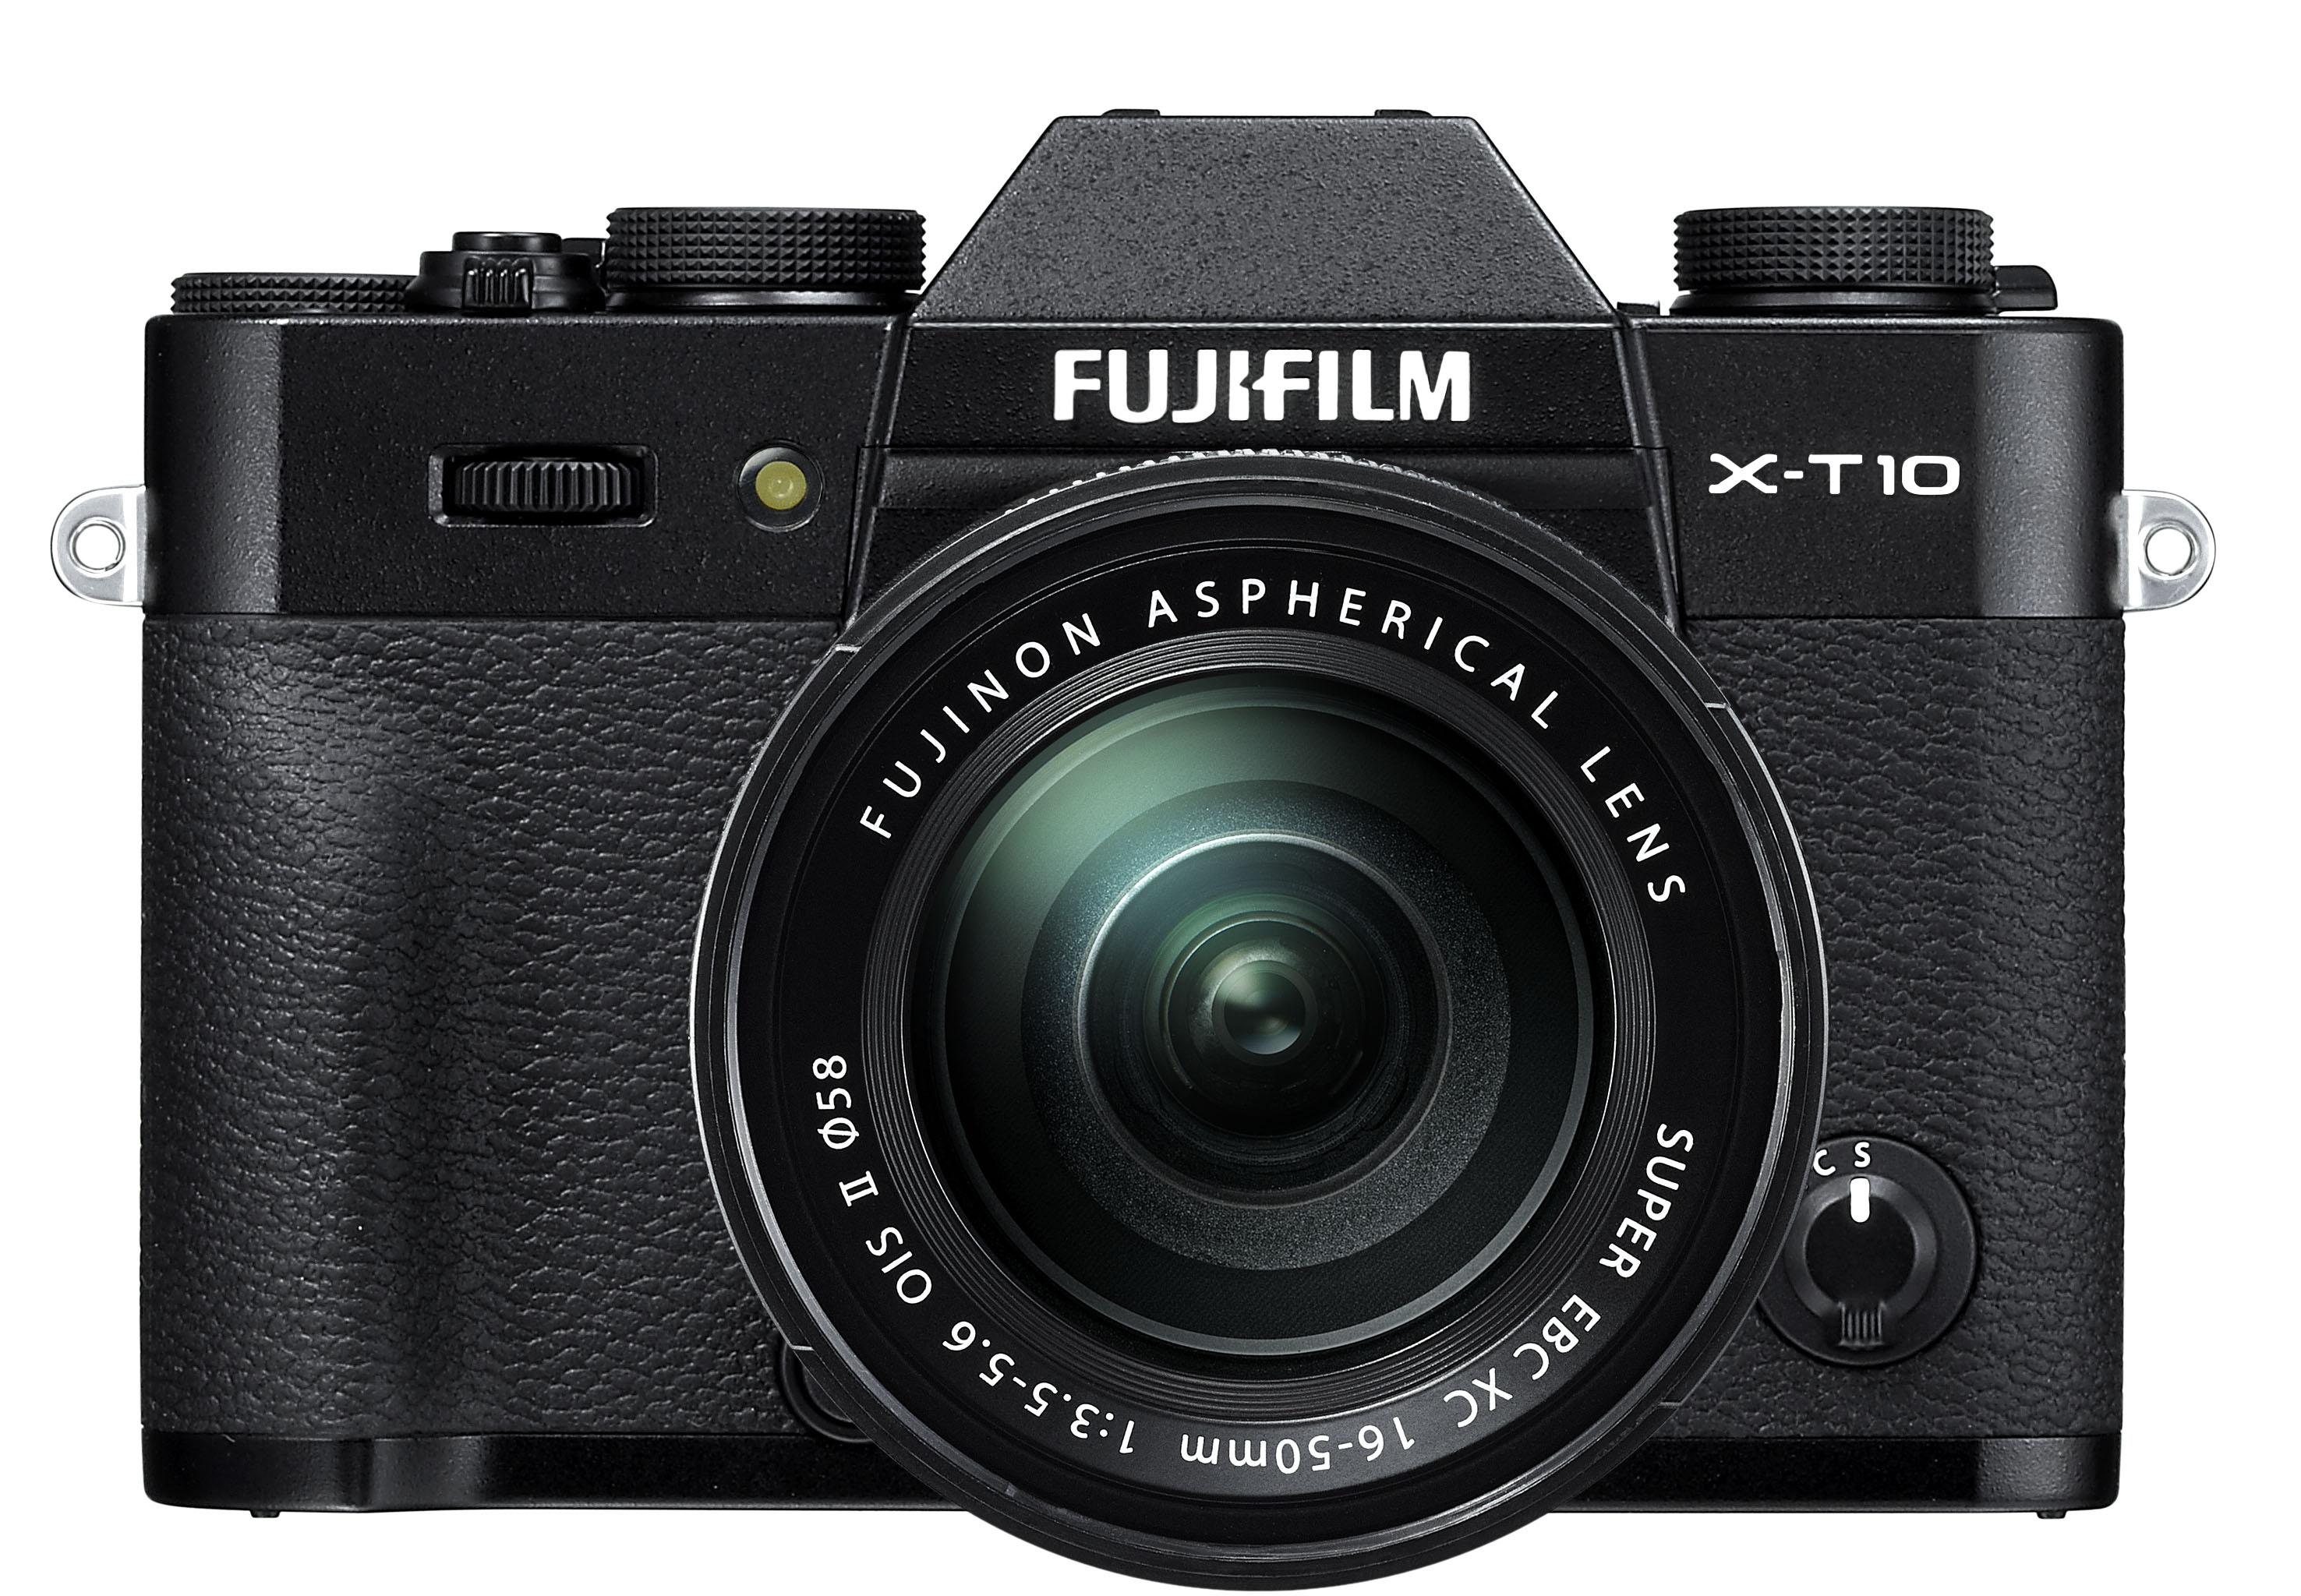 Fujifilm F X-T10 16-50 Kit, black - (16.7 млн, 1920x1080, 8 кадр./сек, 920000 точек, 3 дюйма)